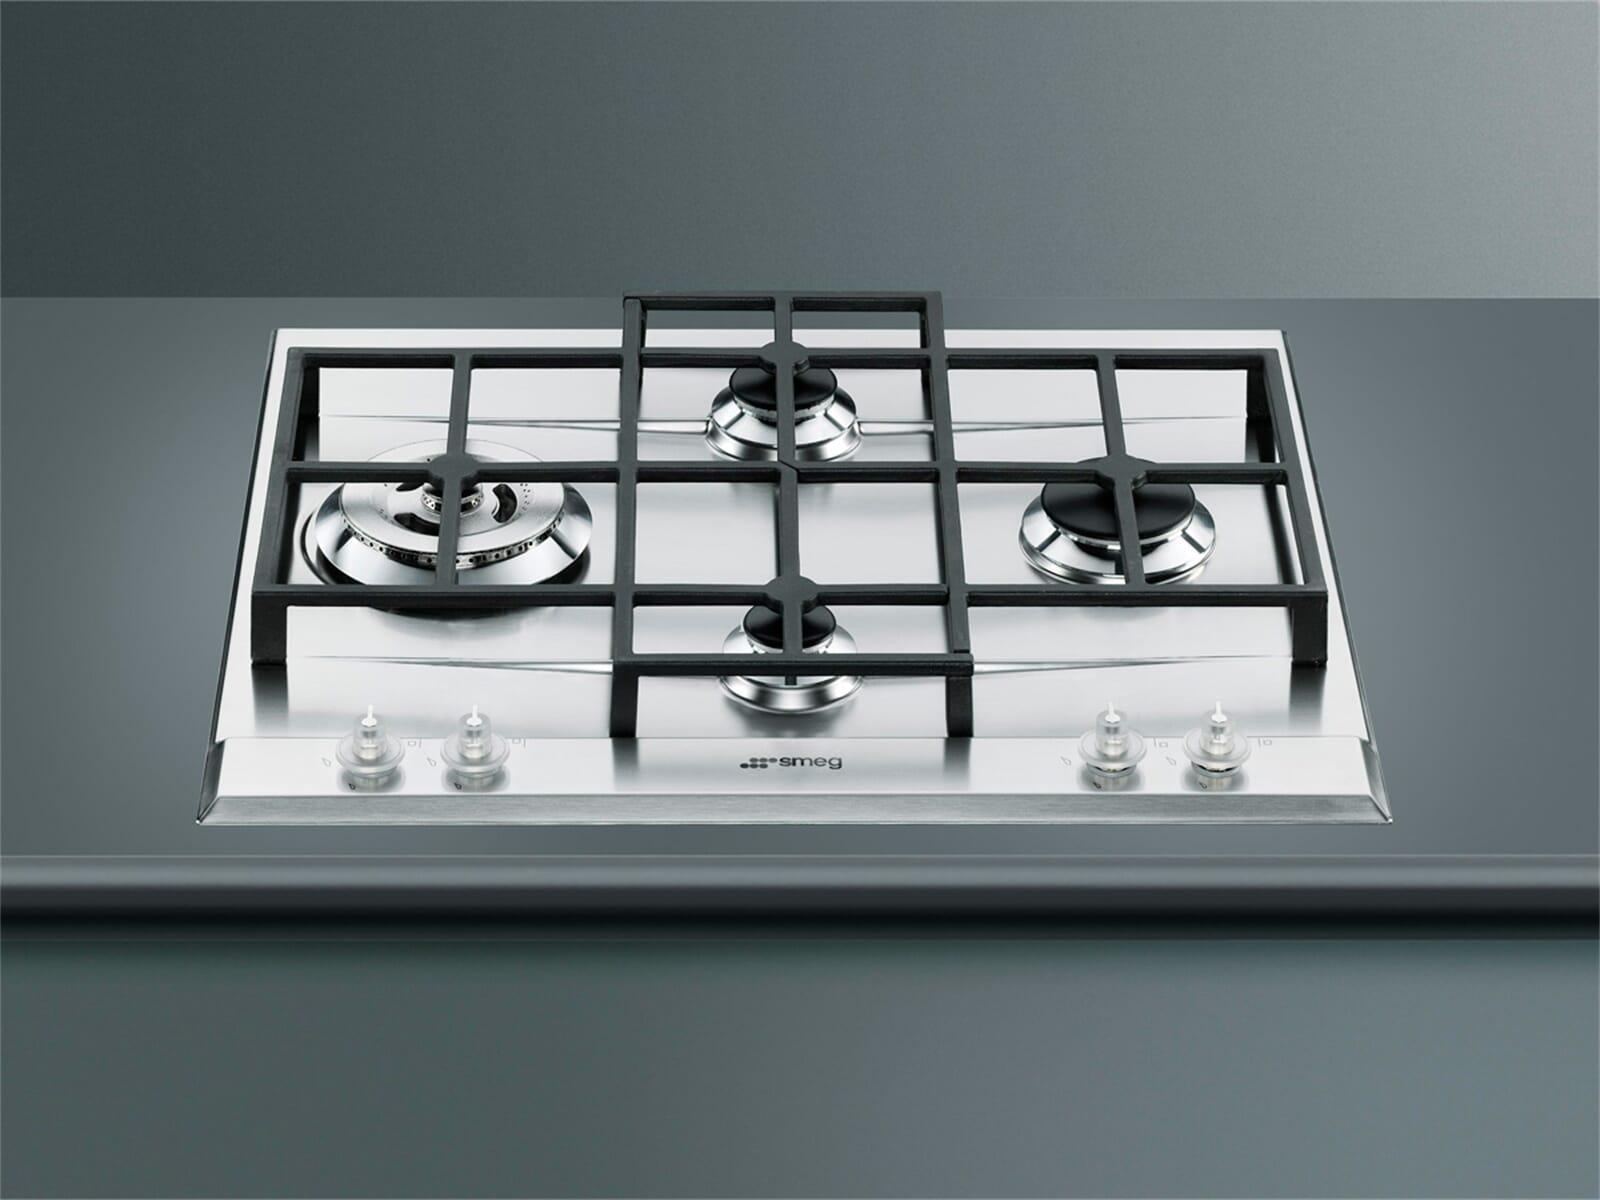 smeg p1641xd edelstahl gaskochfeld autark. Black Bedroom Furniture Sets. Home Design Ideas